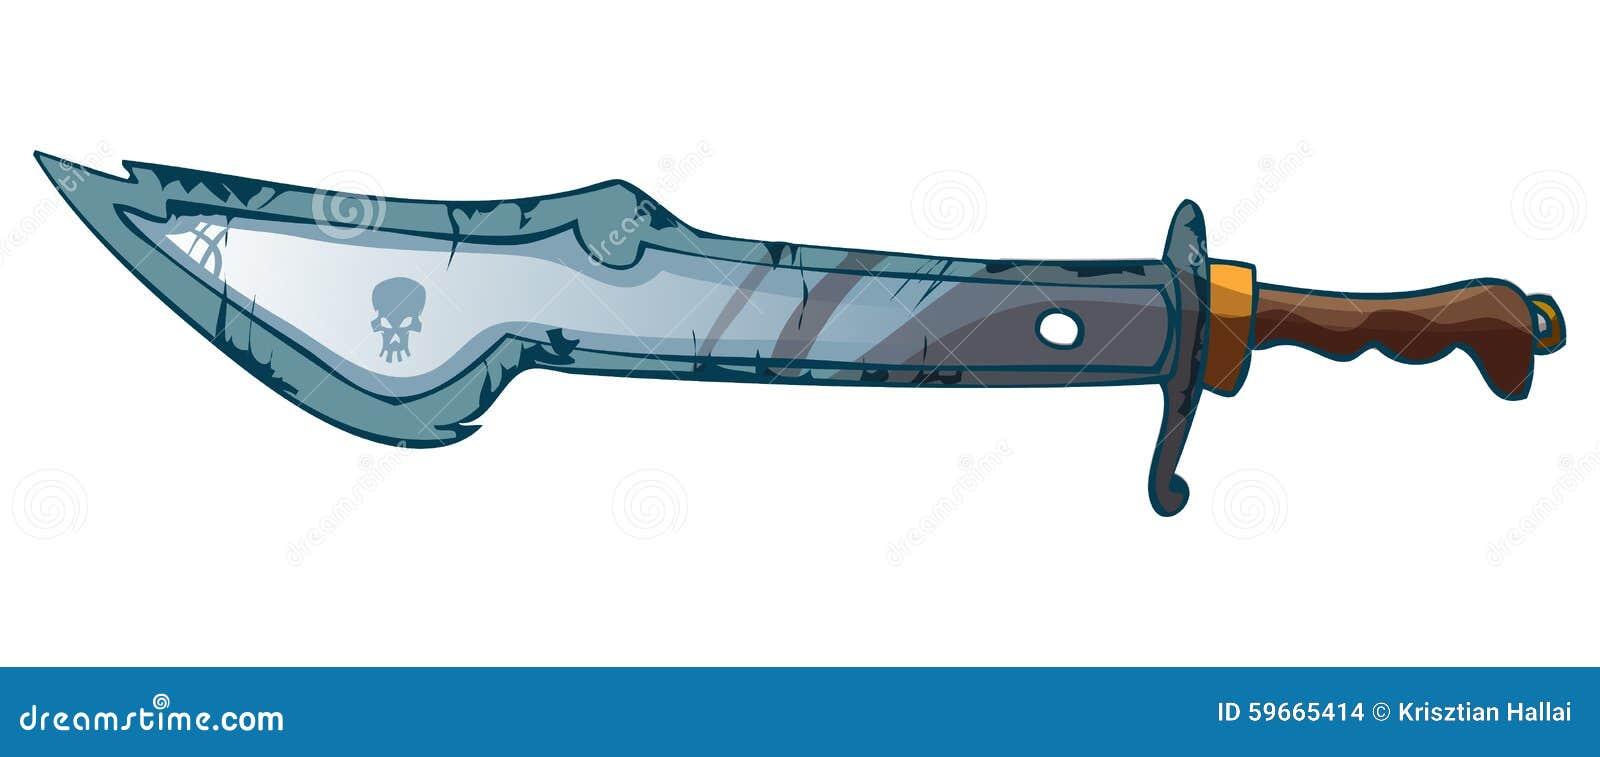 Cartoon Pirate Sword Vector Illustration